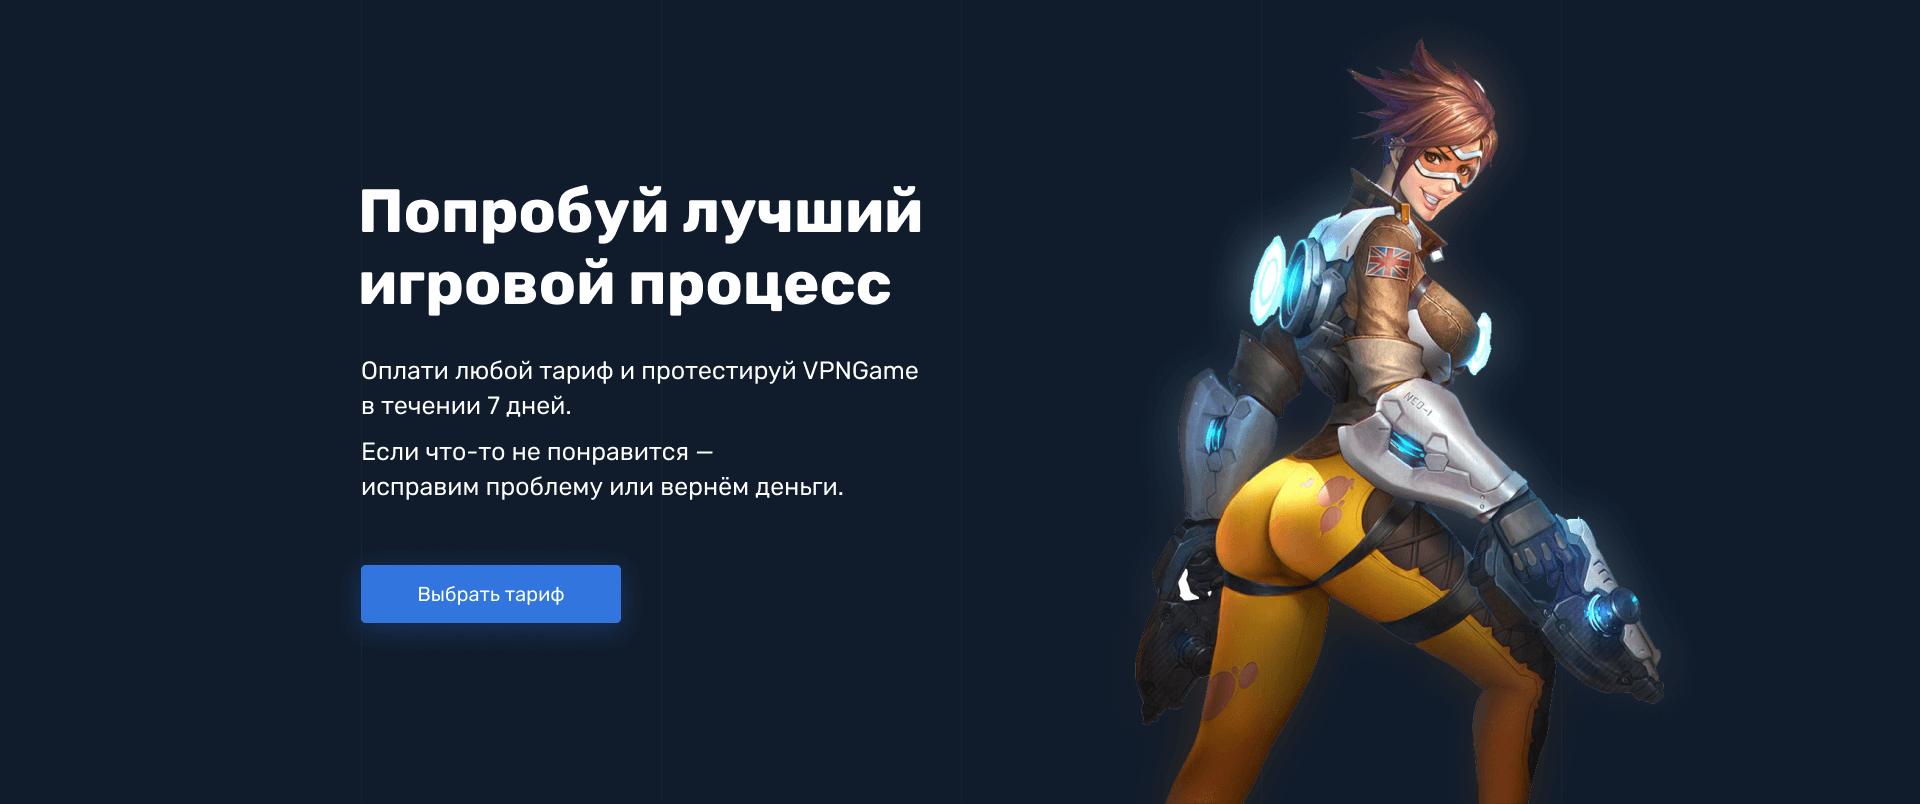 Дизайн и вёрстка проекта VPNGame 45